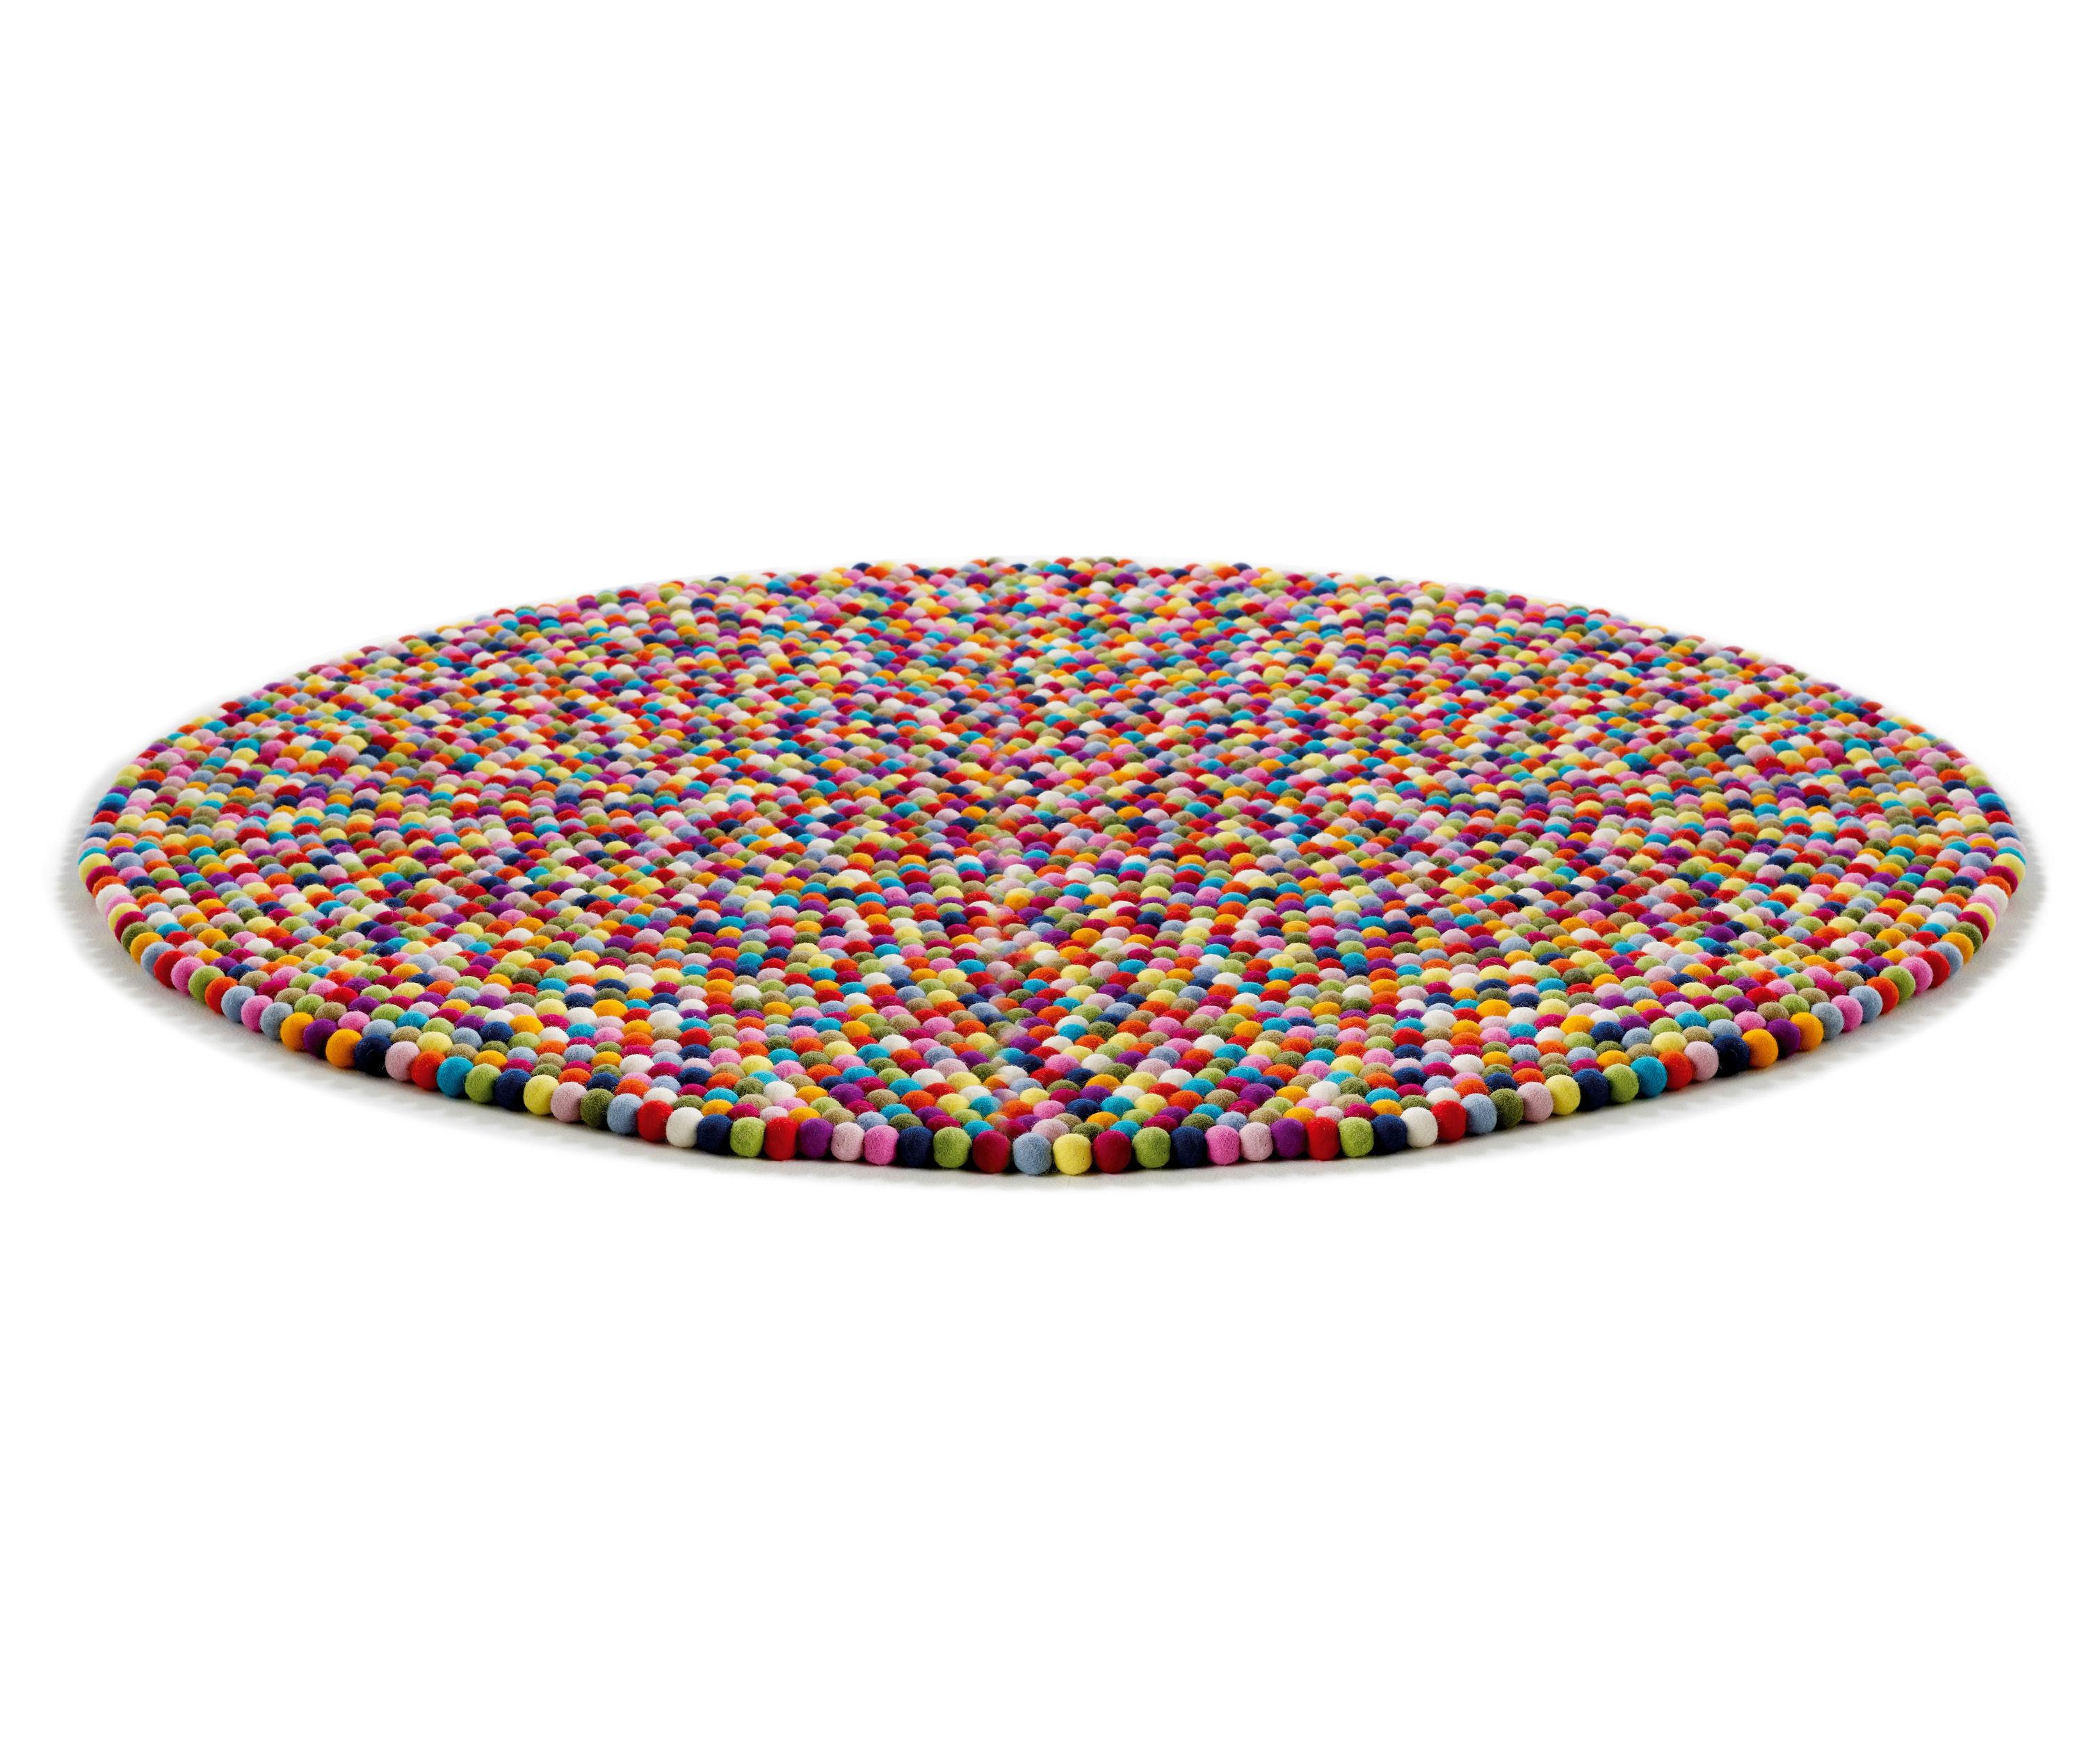 Mobilier - Tapis - Tapis Pinocchio Ø 140 cm - Hay - Multicolore - Laine